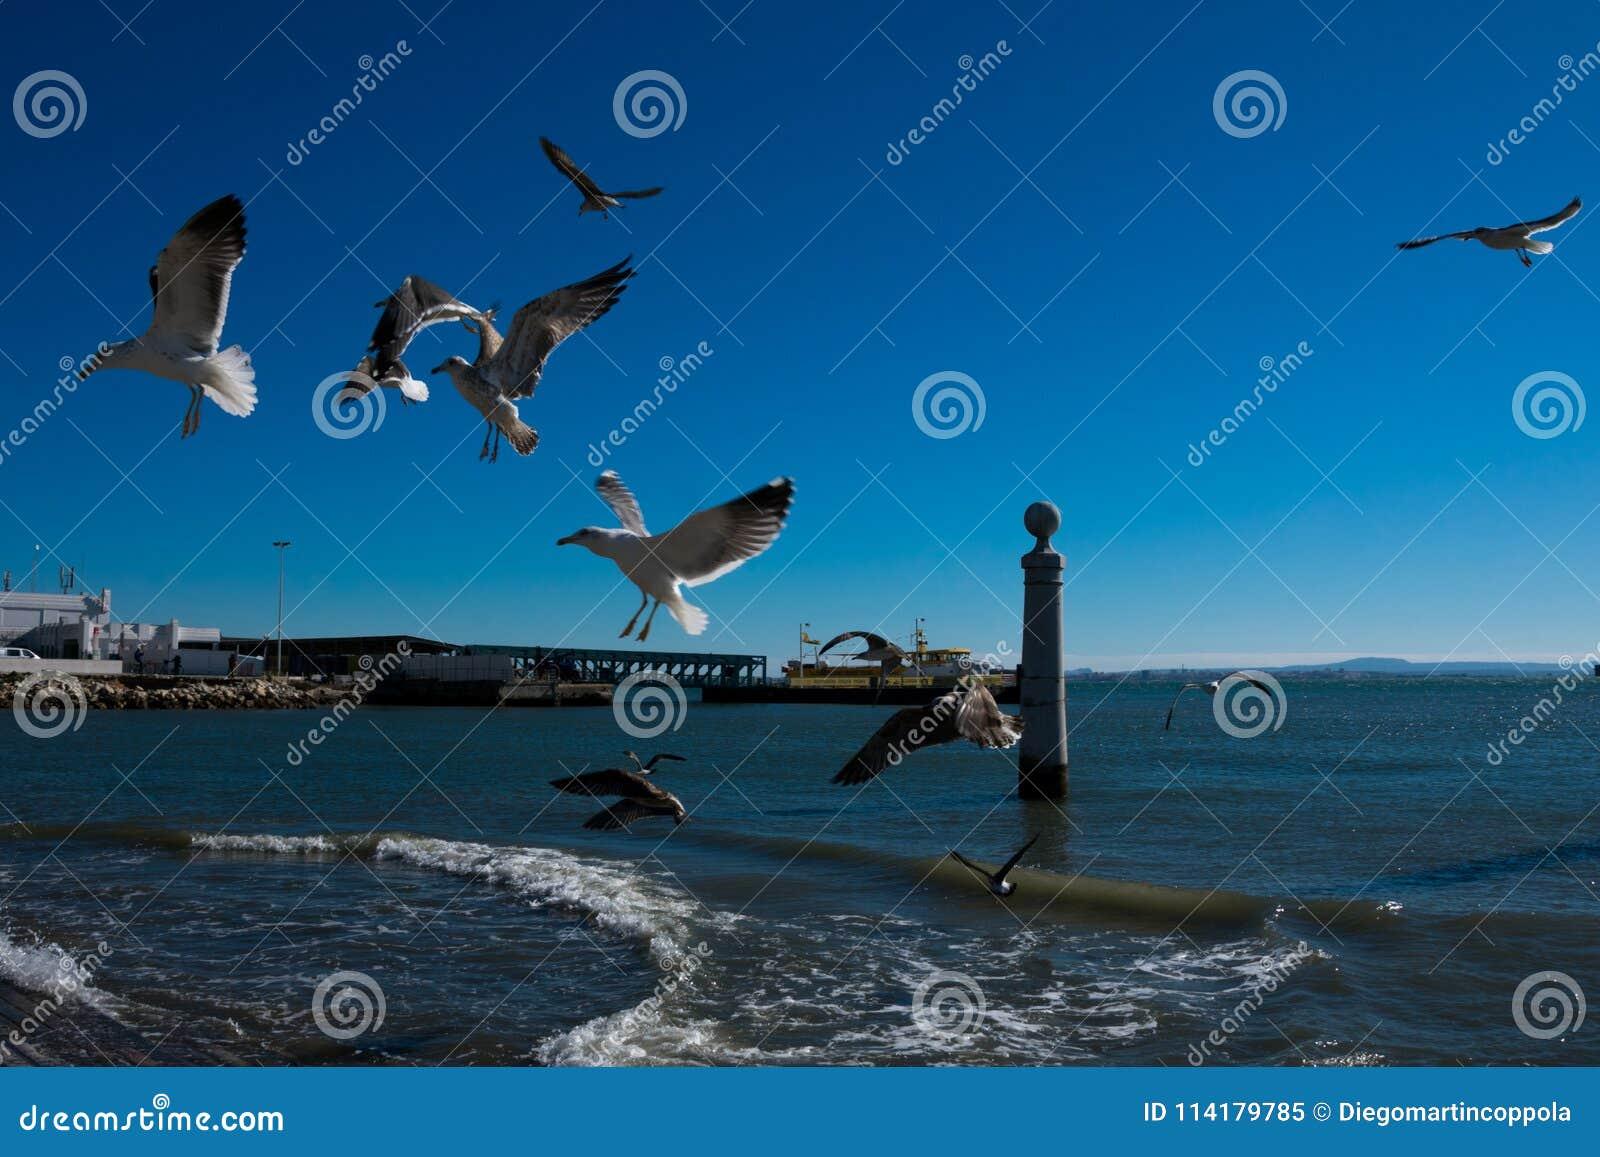 Zeemeeuwen vliegen die wachten worden gevoed Tagusrivier